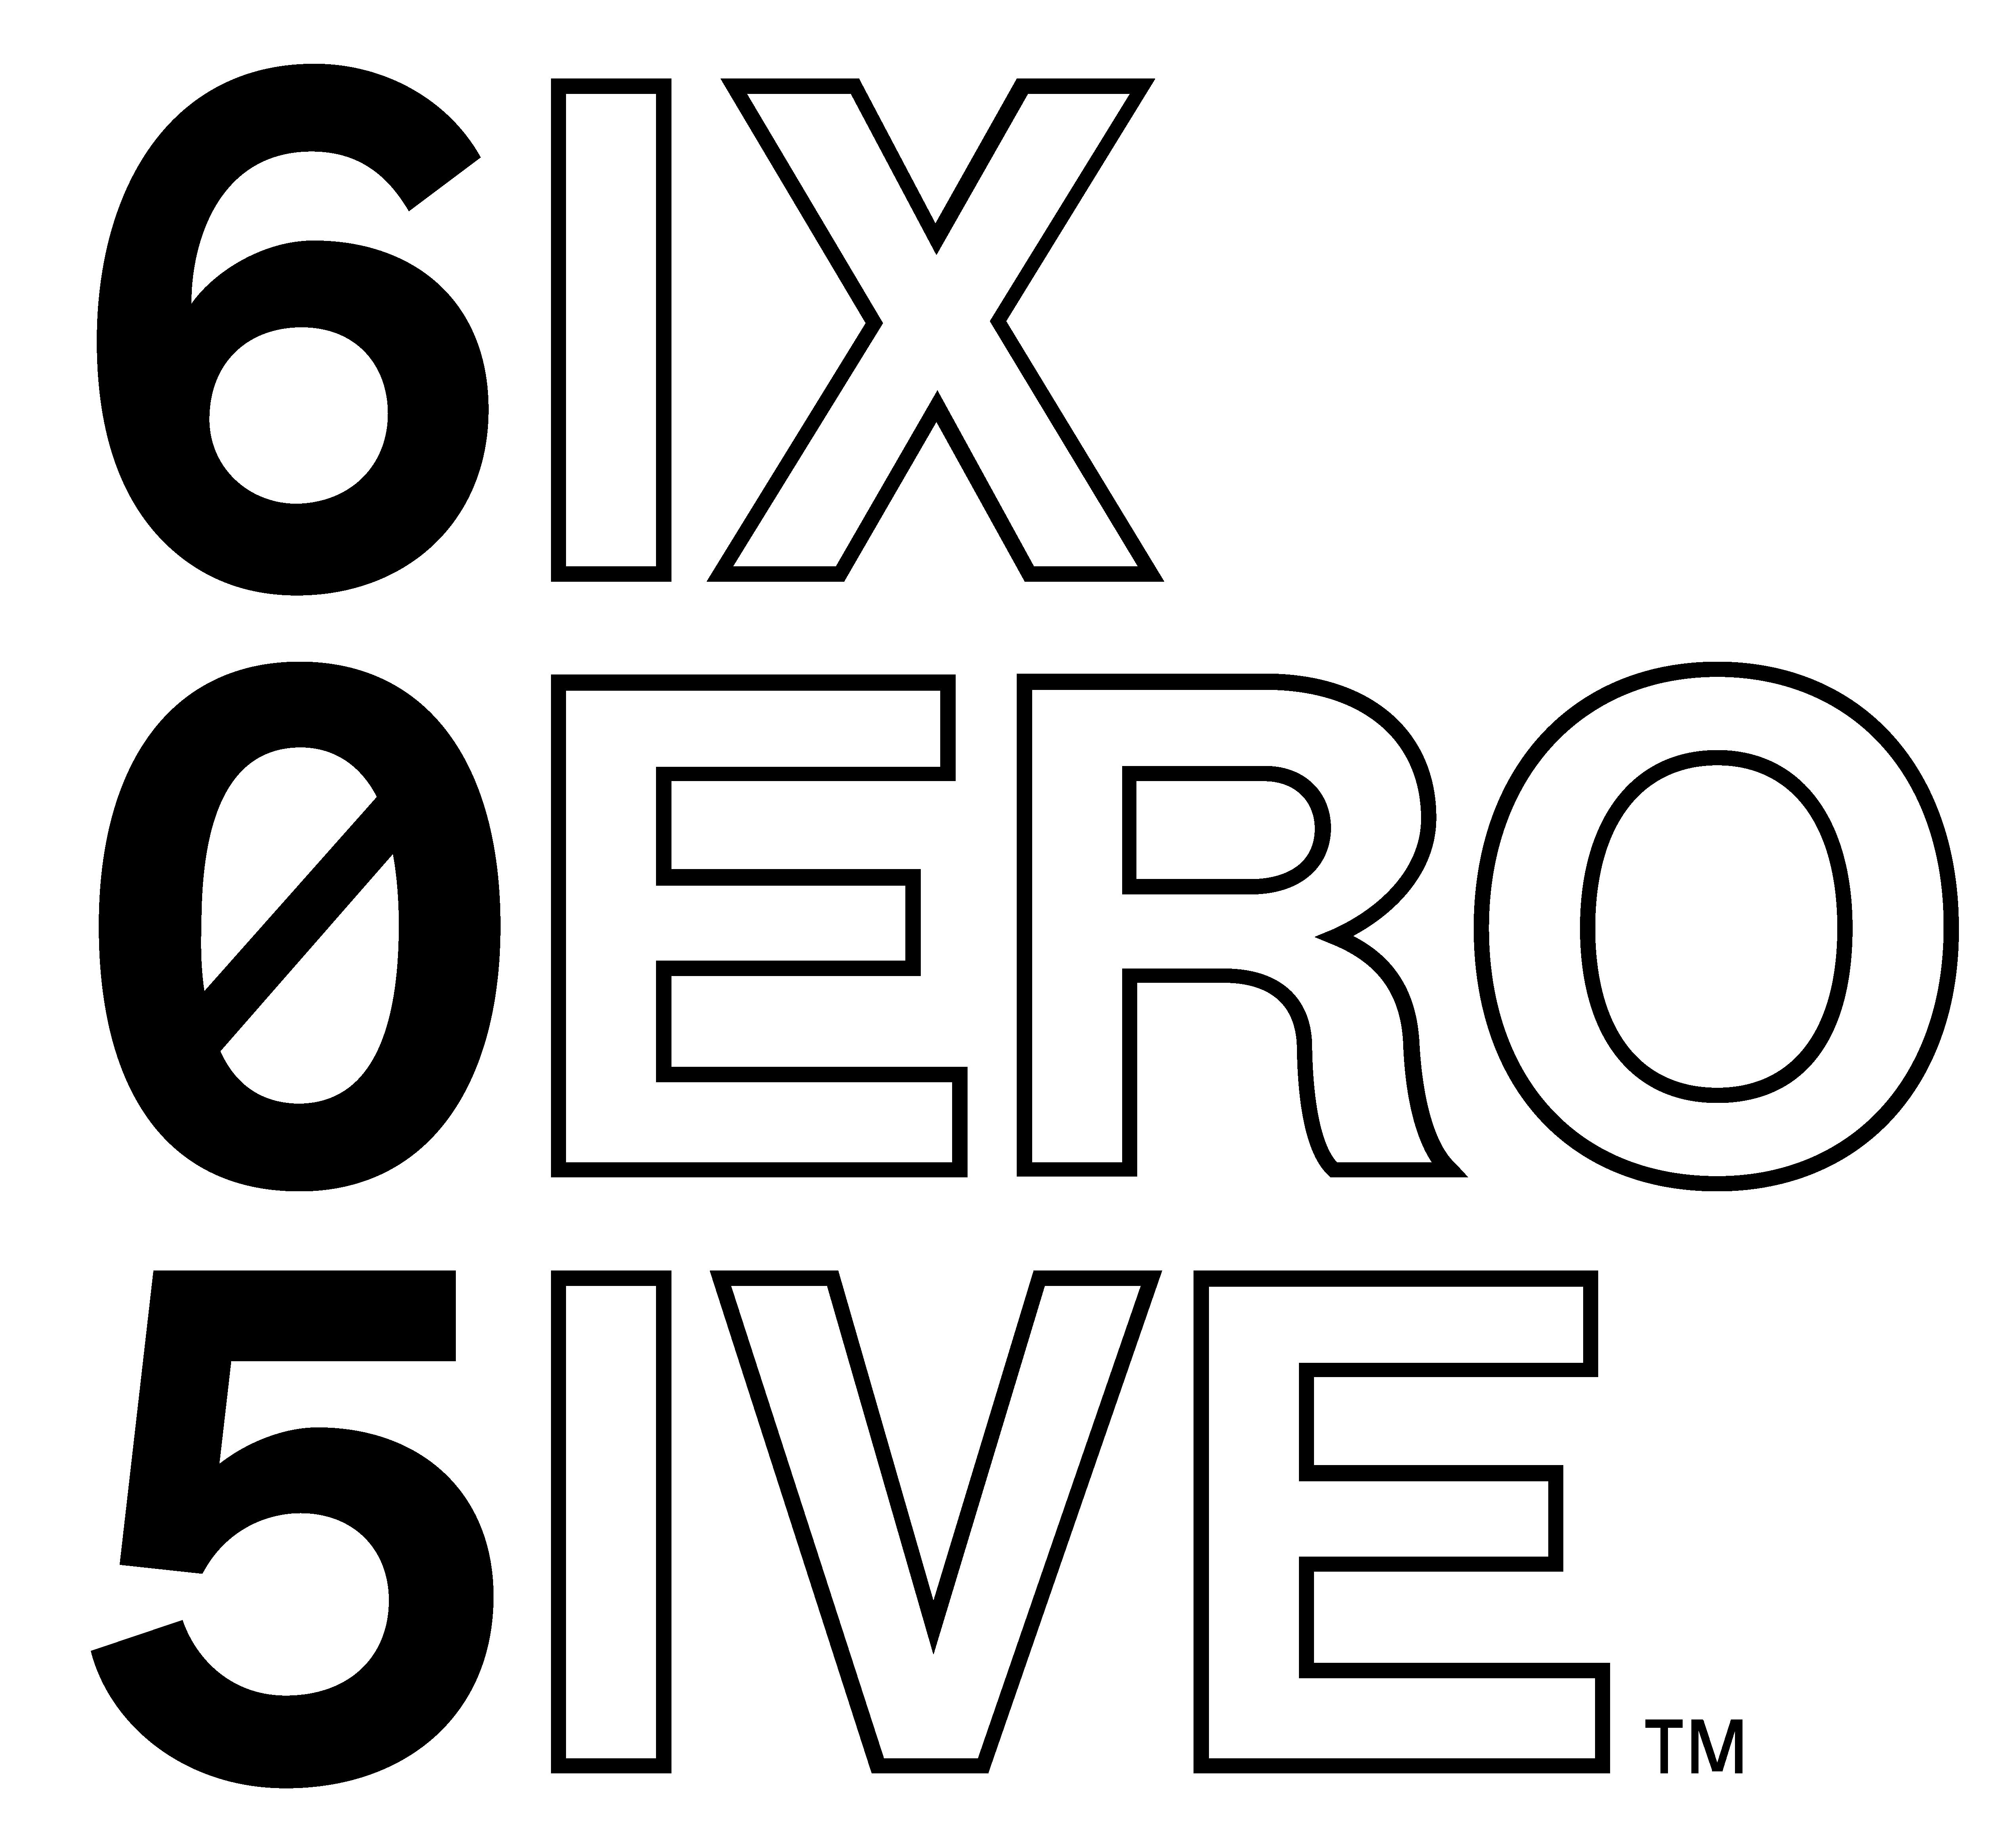 605TV